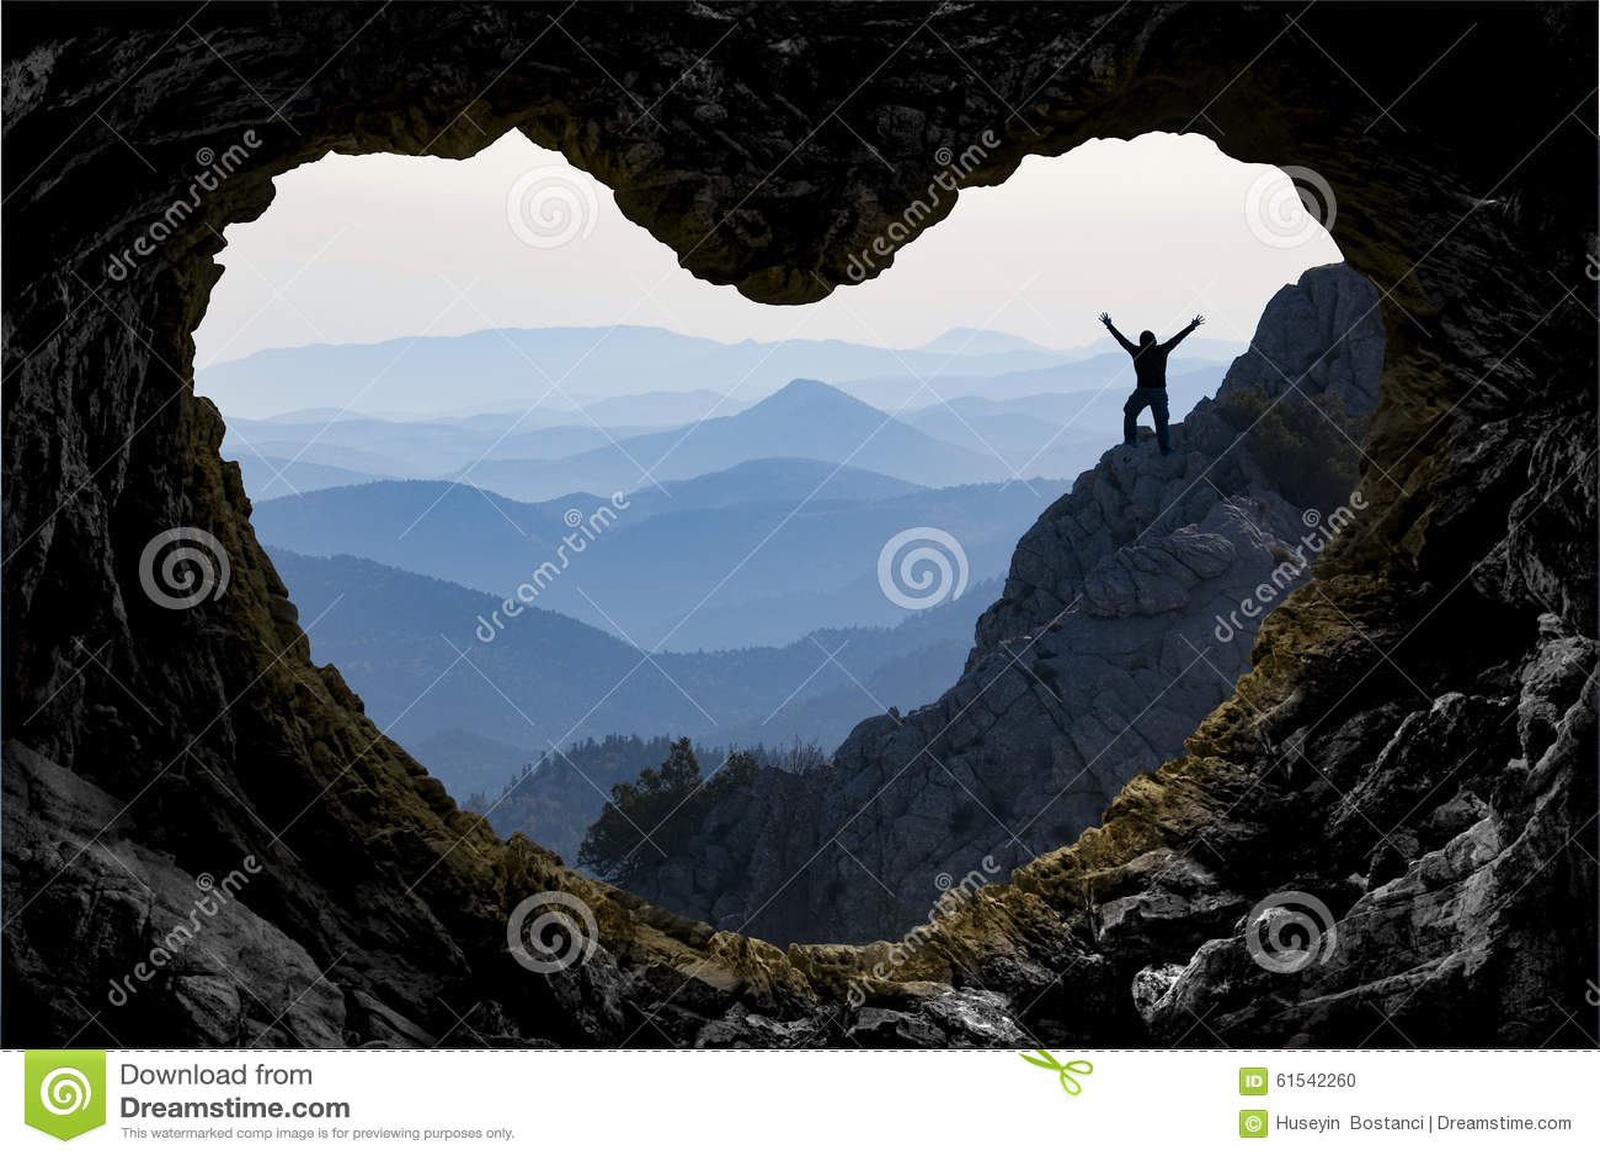 Target achievement in mountain adventure